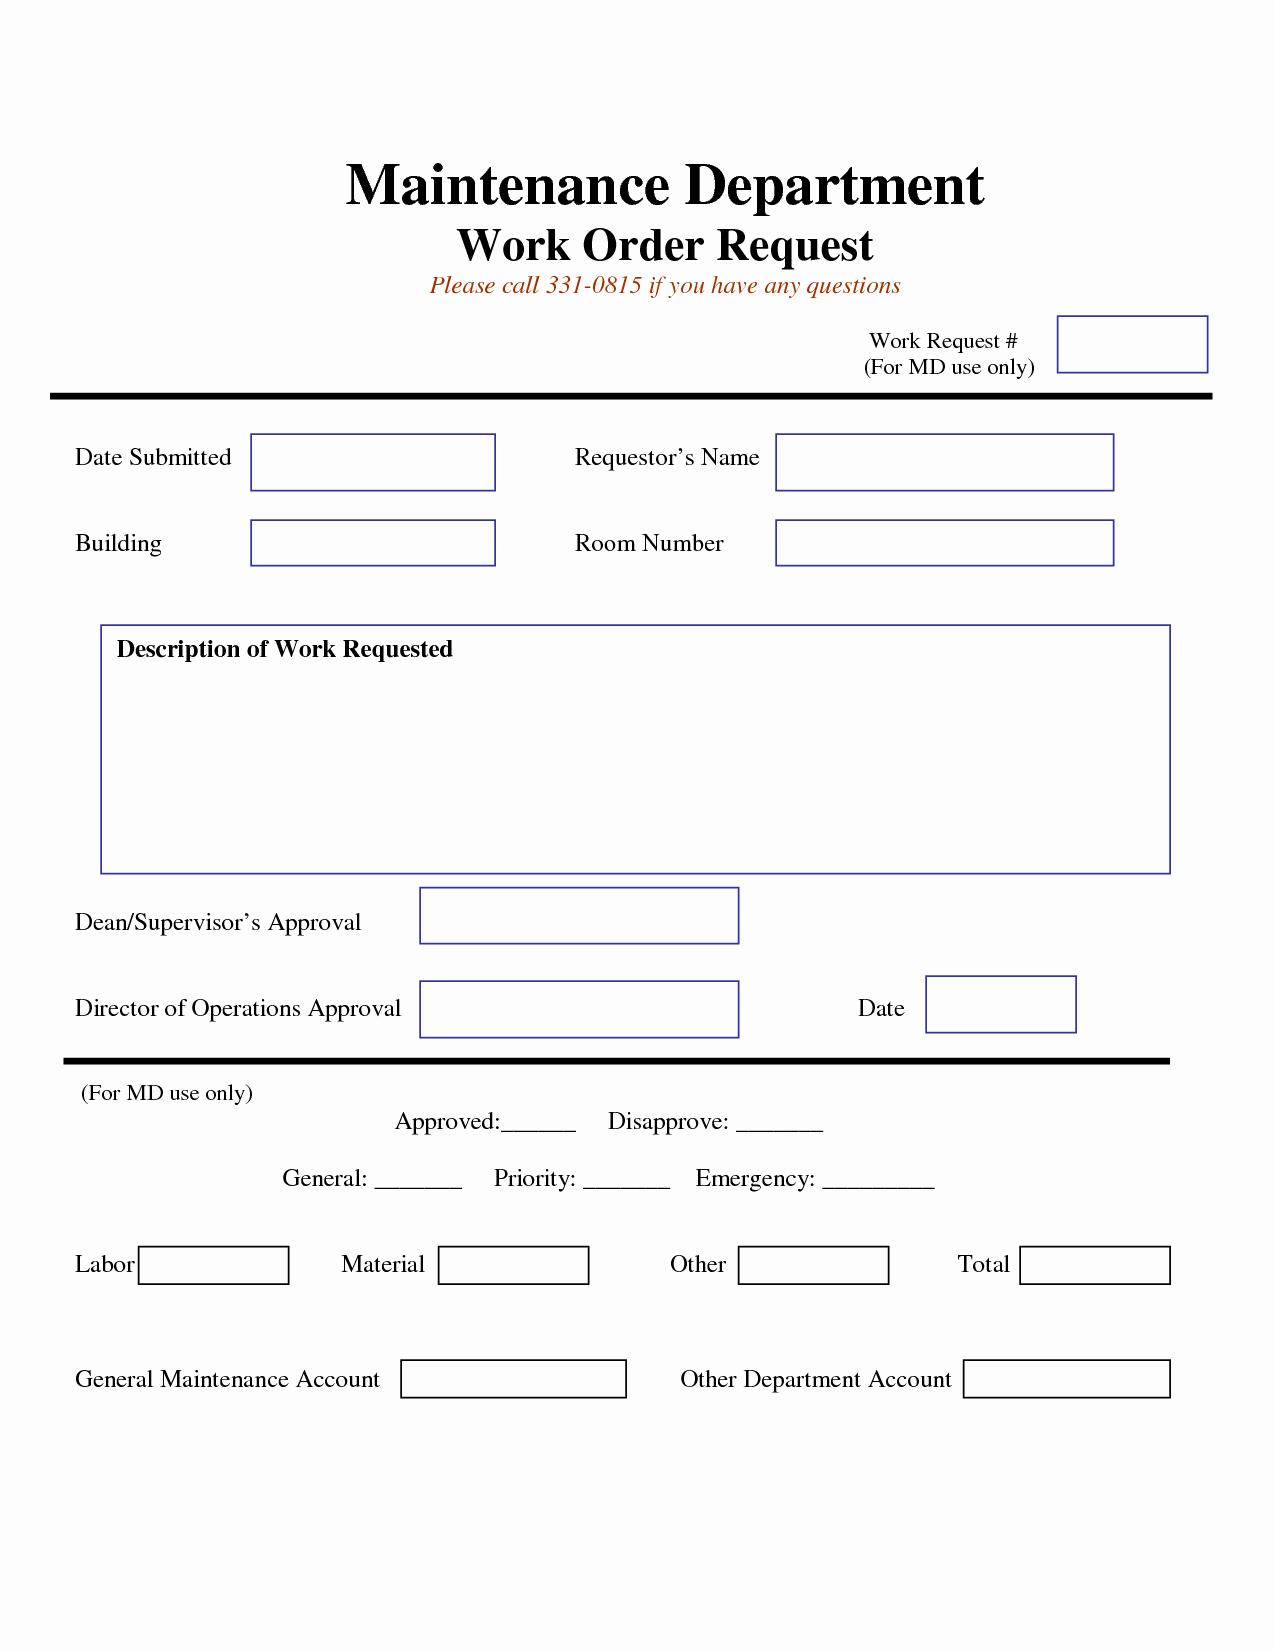 Maintenance Work order Template Excel Unique Work Request form